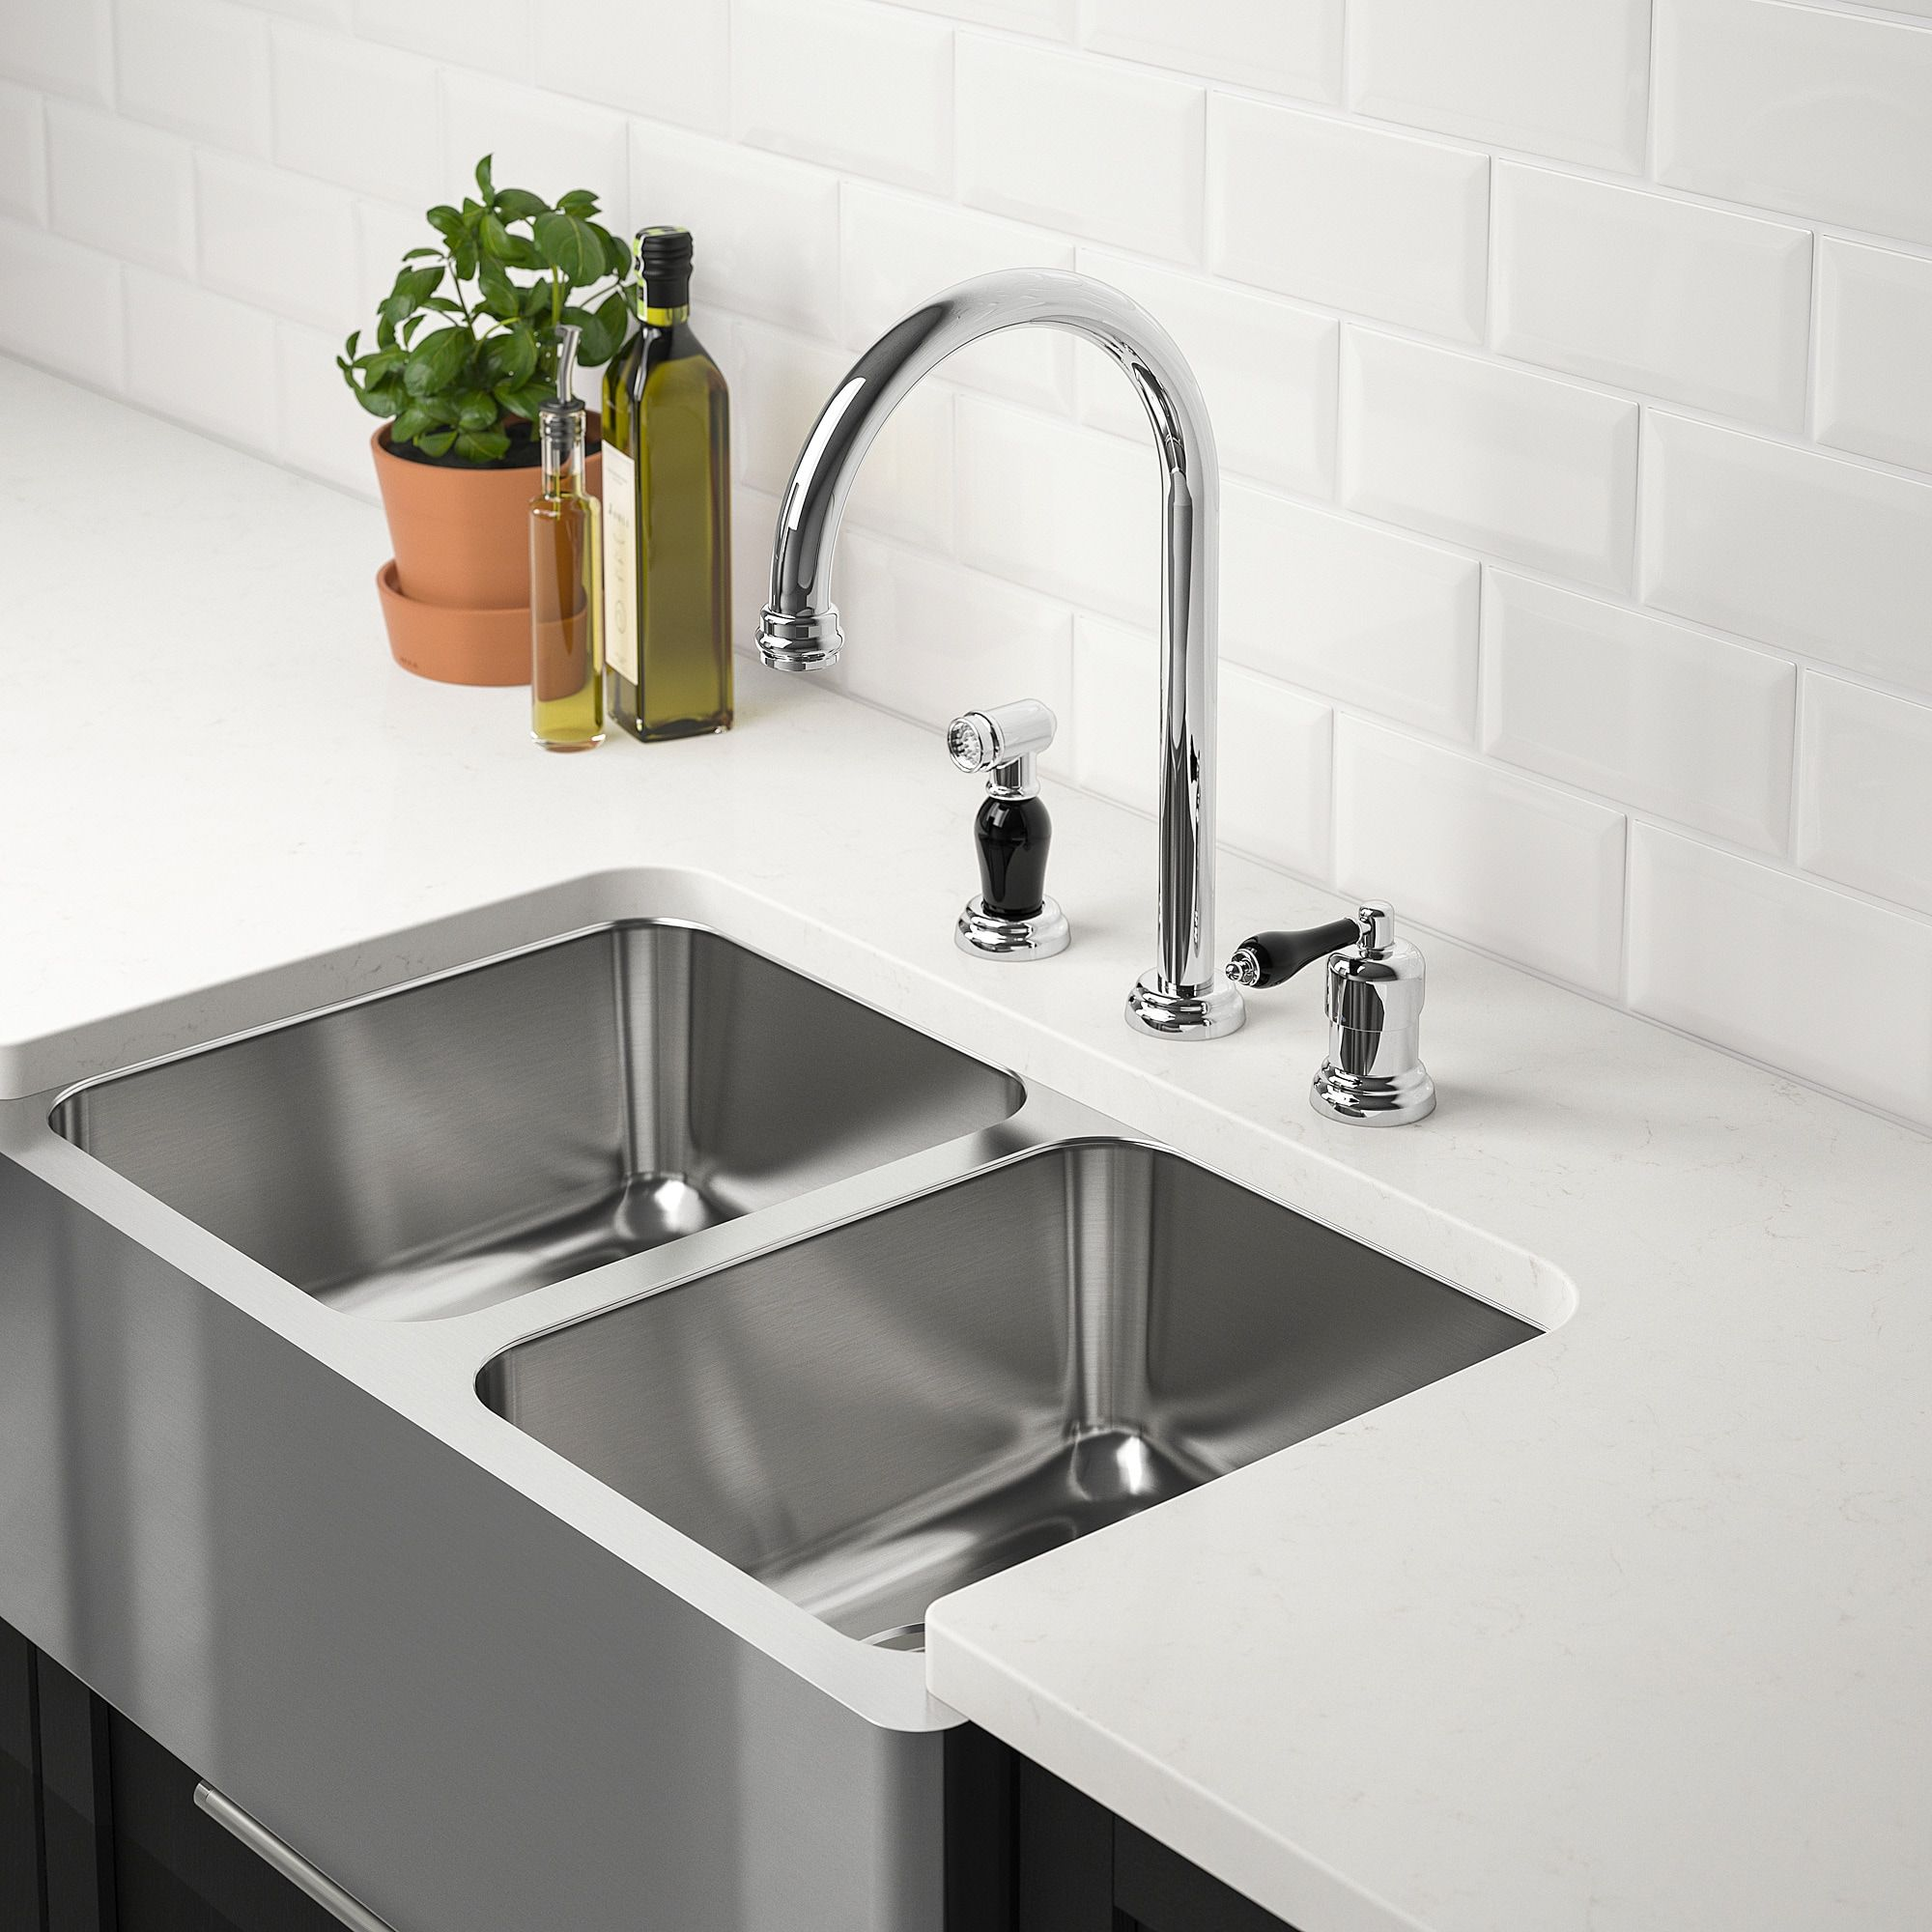 Ikea Bredsjon Apron Front Double Bowl Sink Under Glued Stainless Double Bowl Sink Double Bowl Kitchen Sink Double Bowl Undermount Kitchen Sink